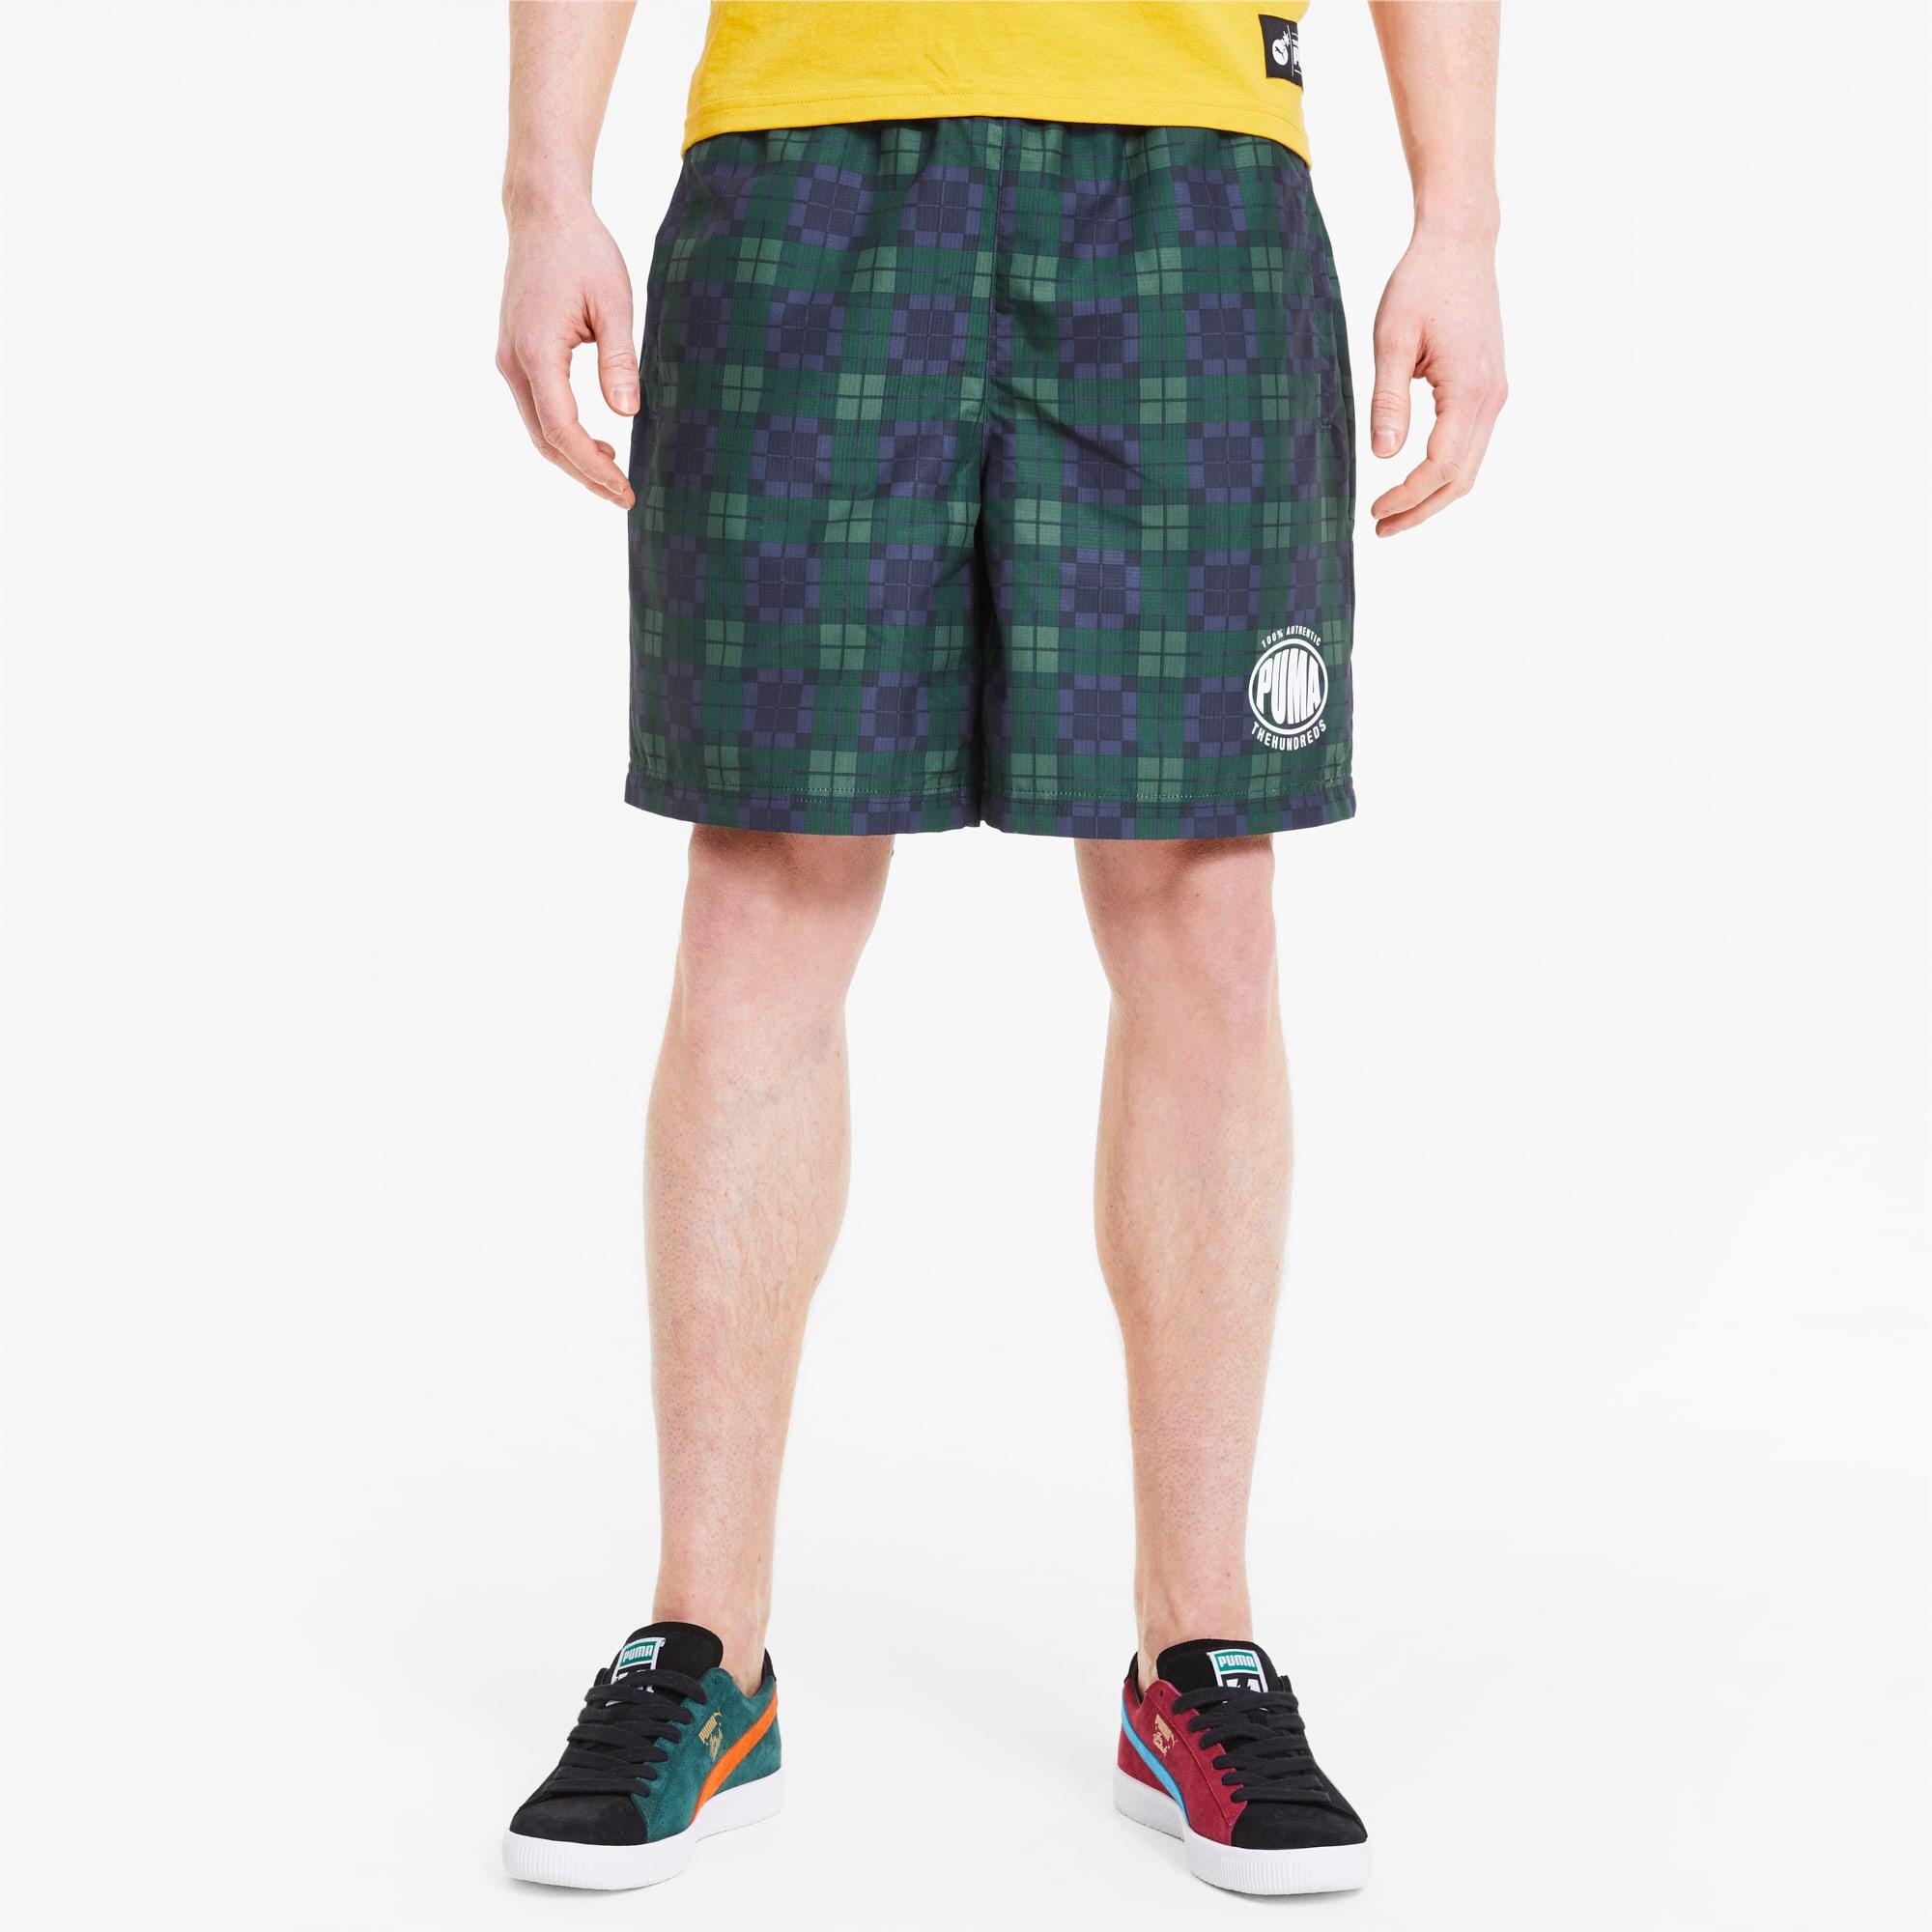 PUMA x THE HUNDREDS Men's AOP Shorts